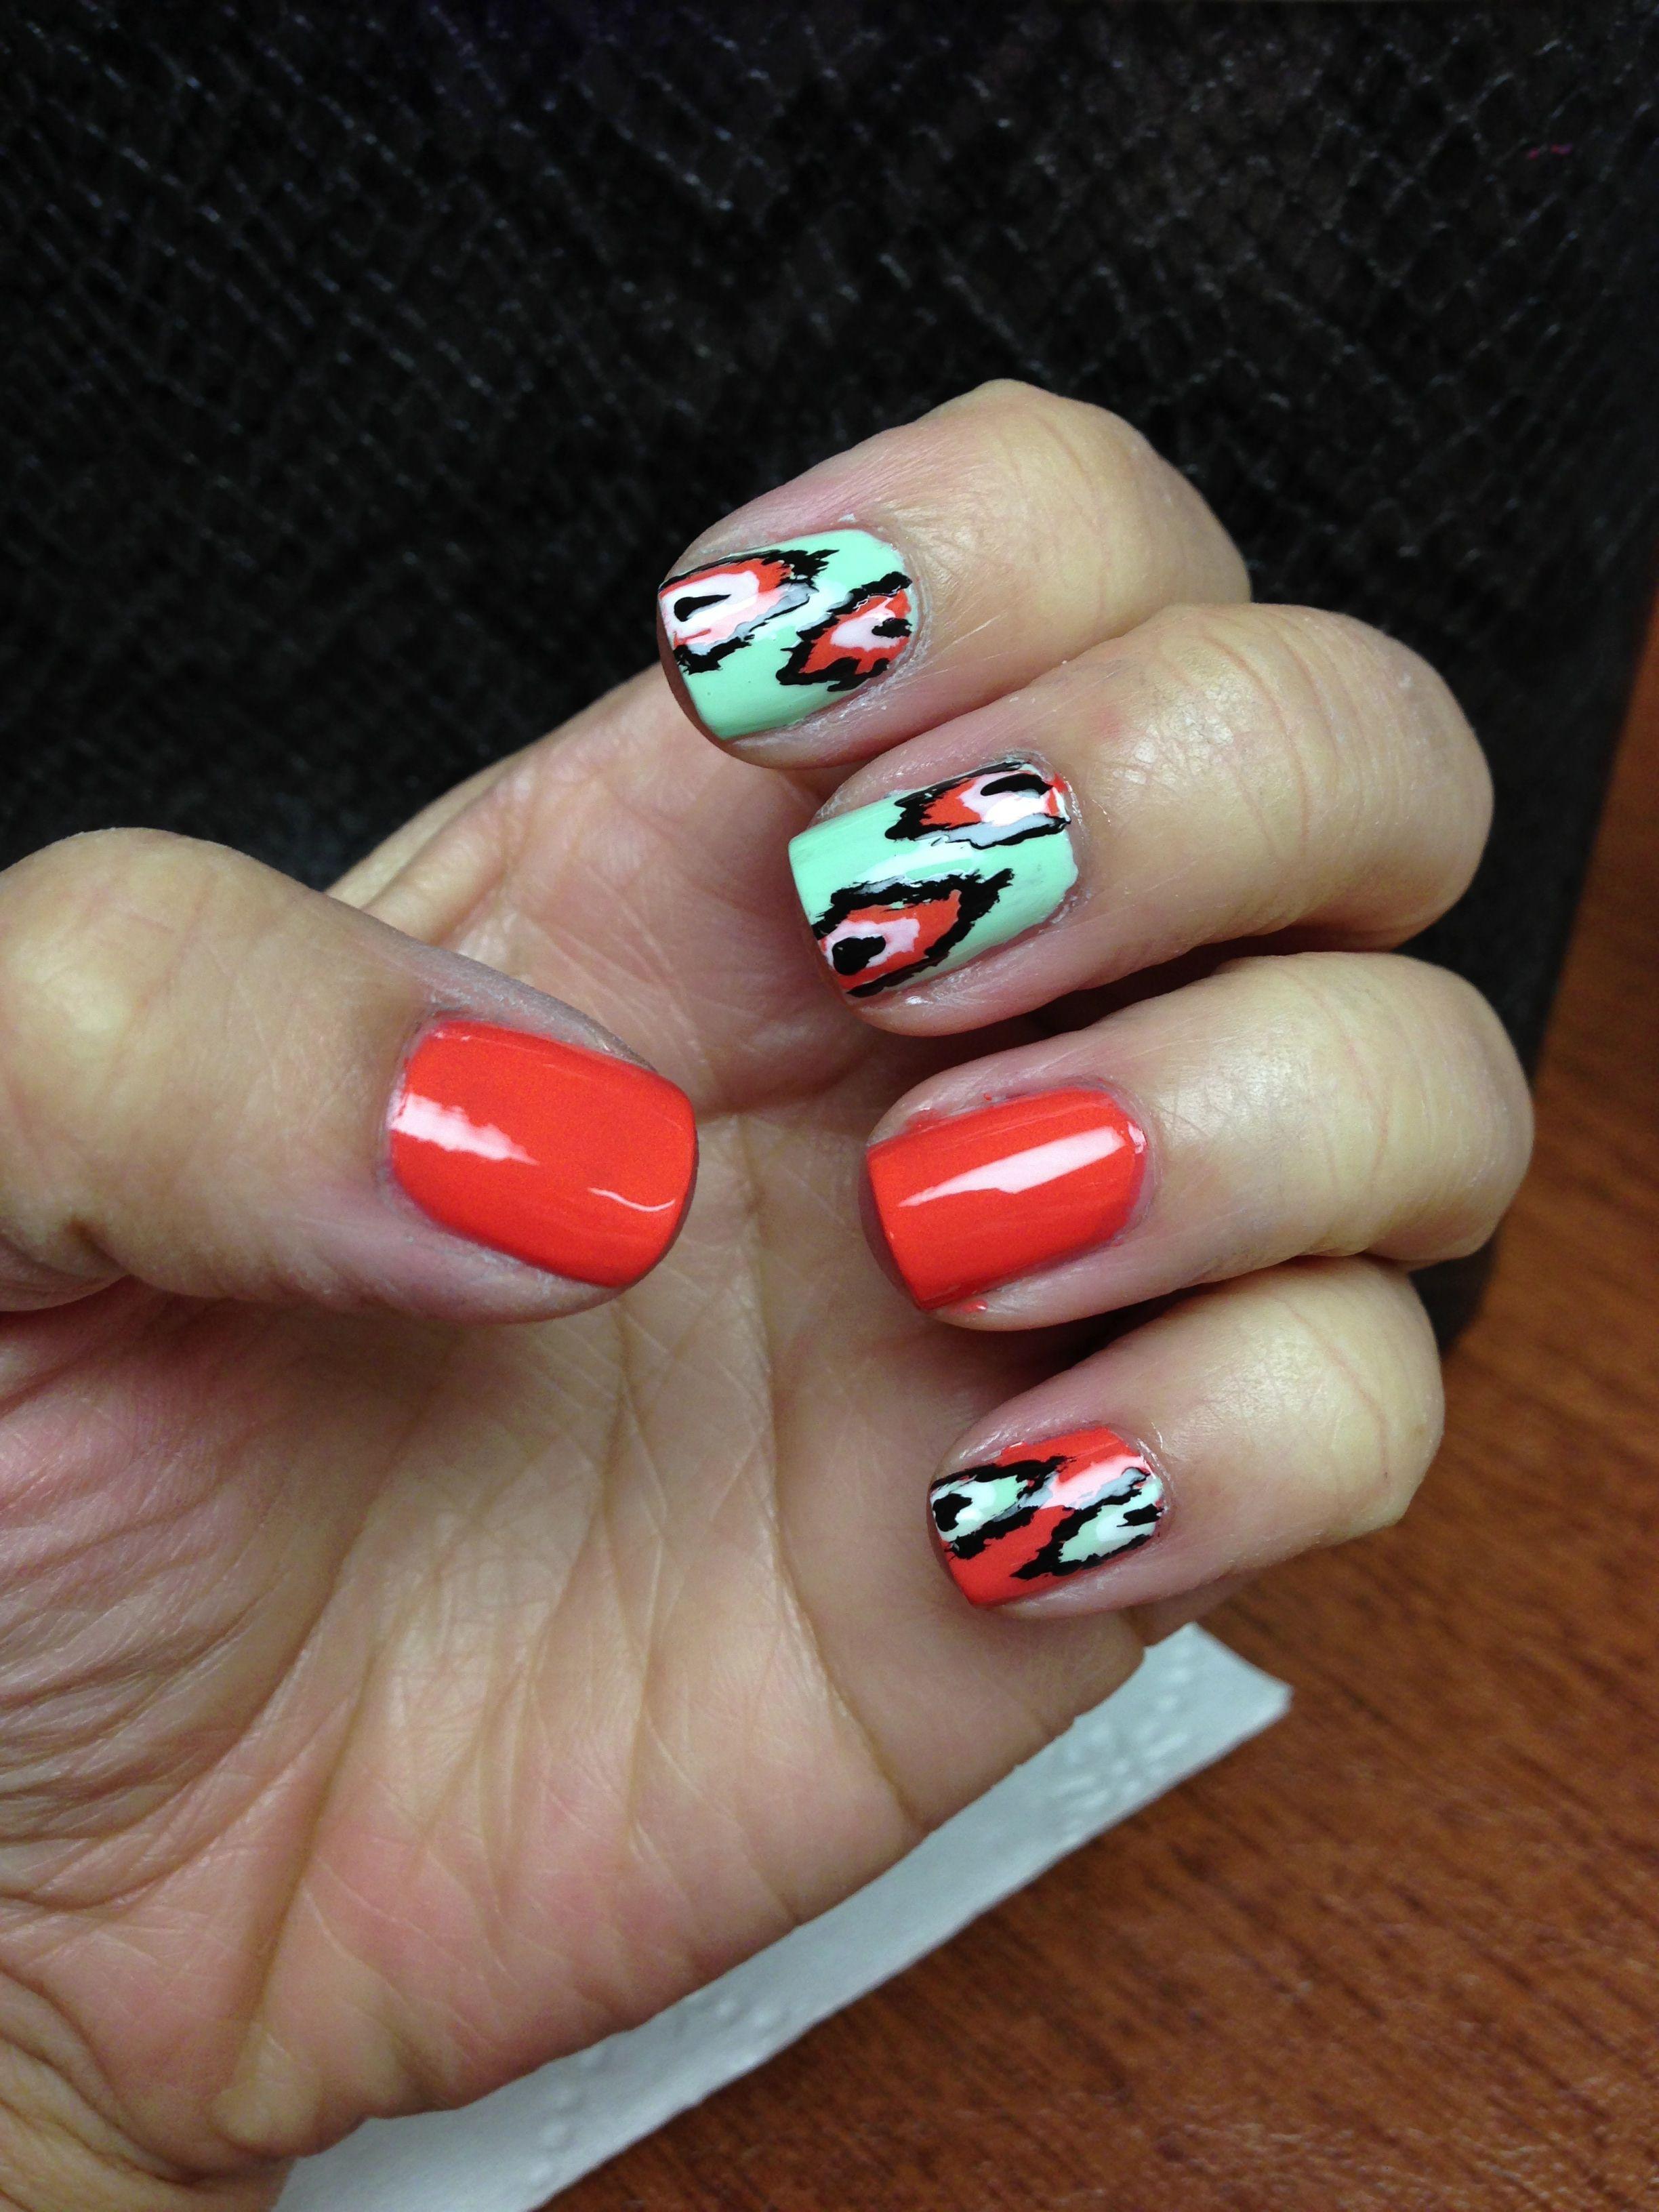 Ikat nailsbut make the pointer finger solid aqua lovin it